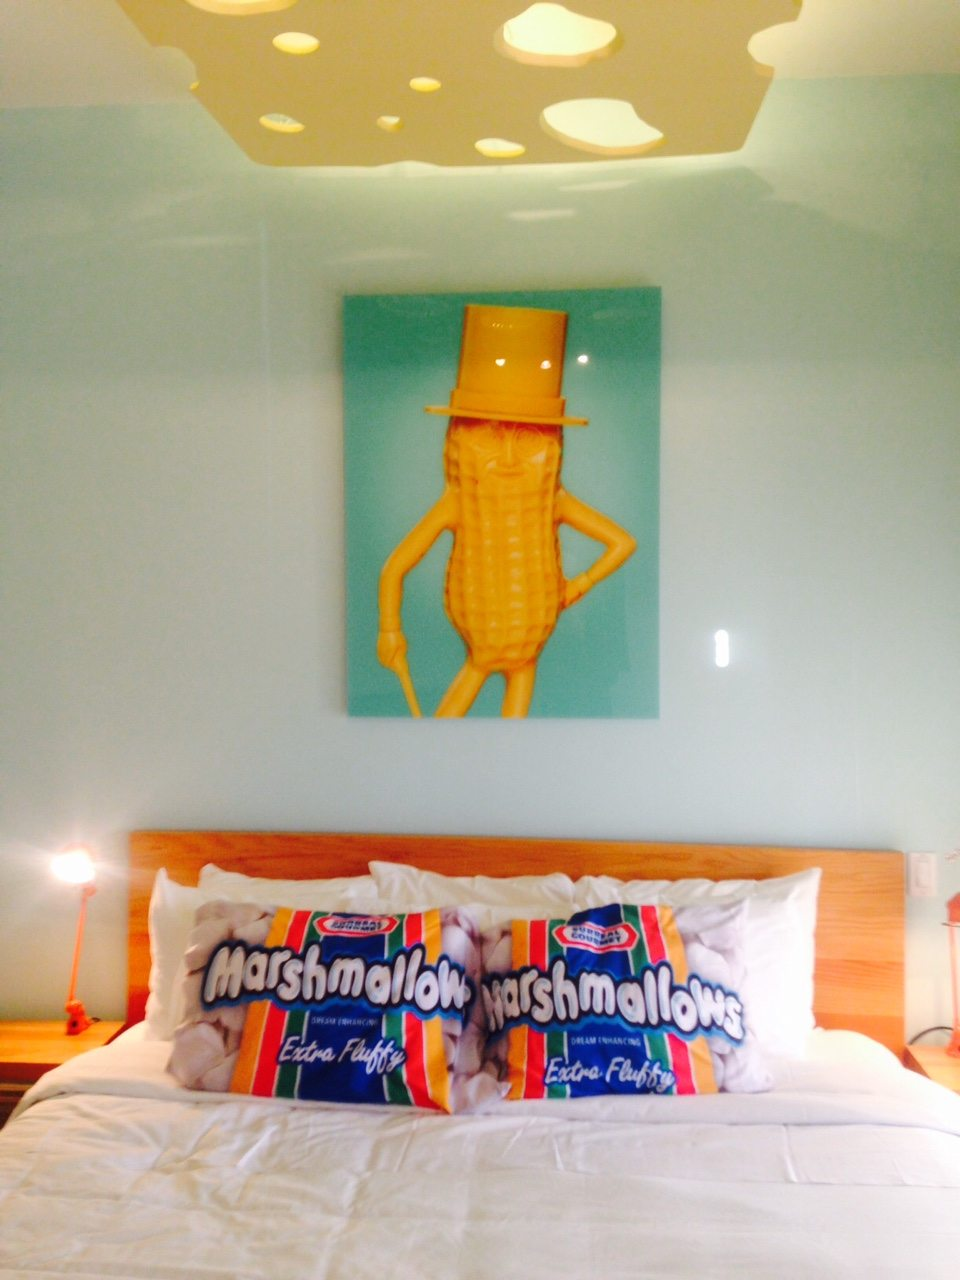 toronto-chefs-restaurants-consumed-bob-blumer-food-network-surreal-gourmet-gladstone-hotel-pillows